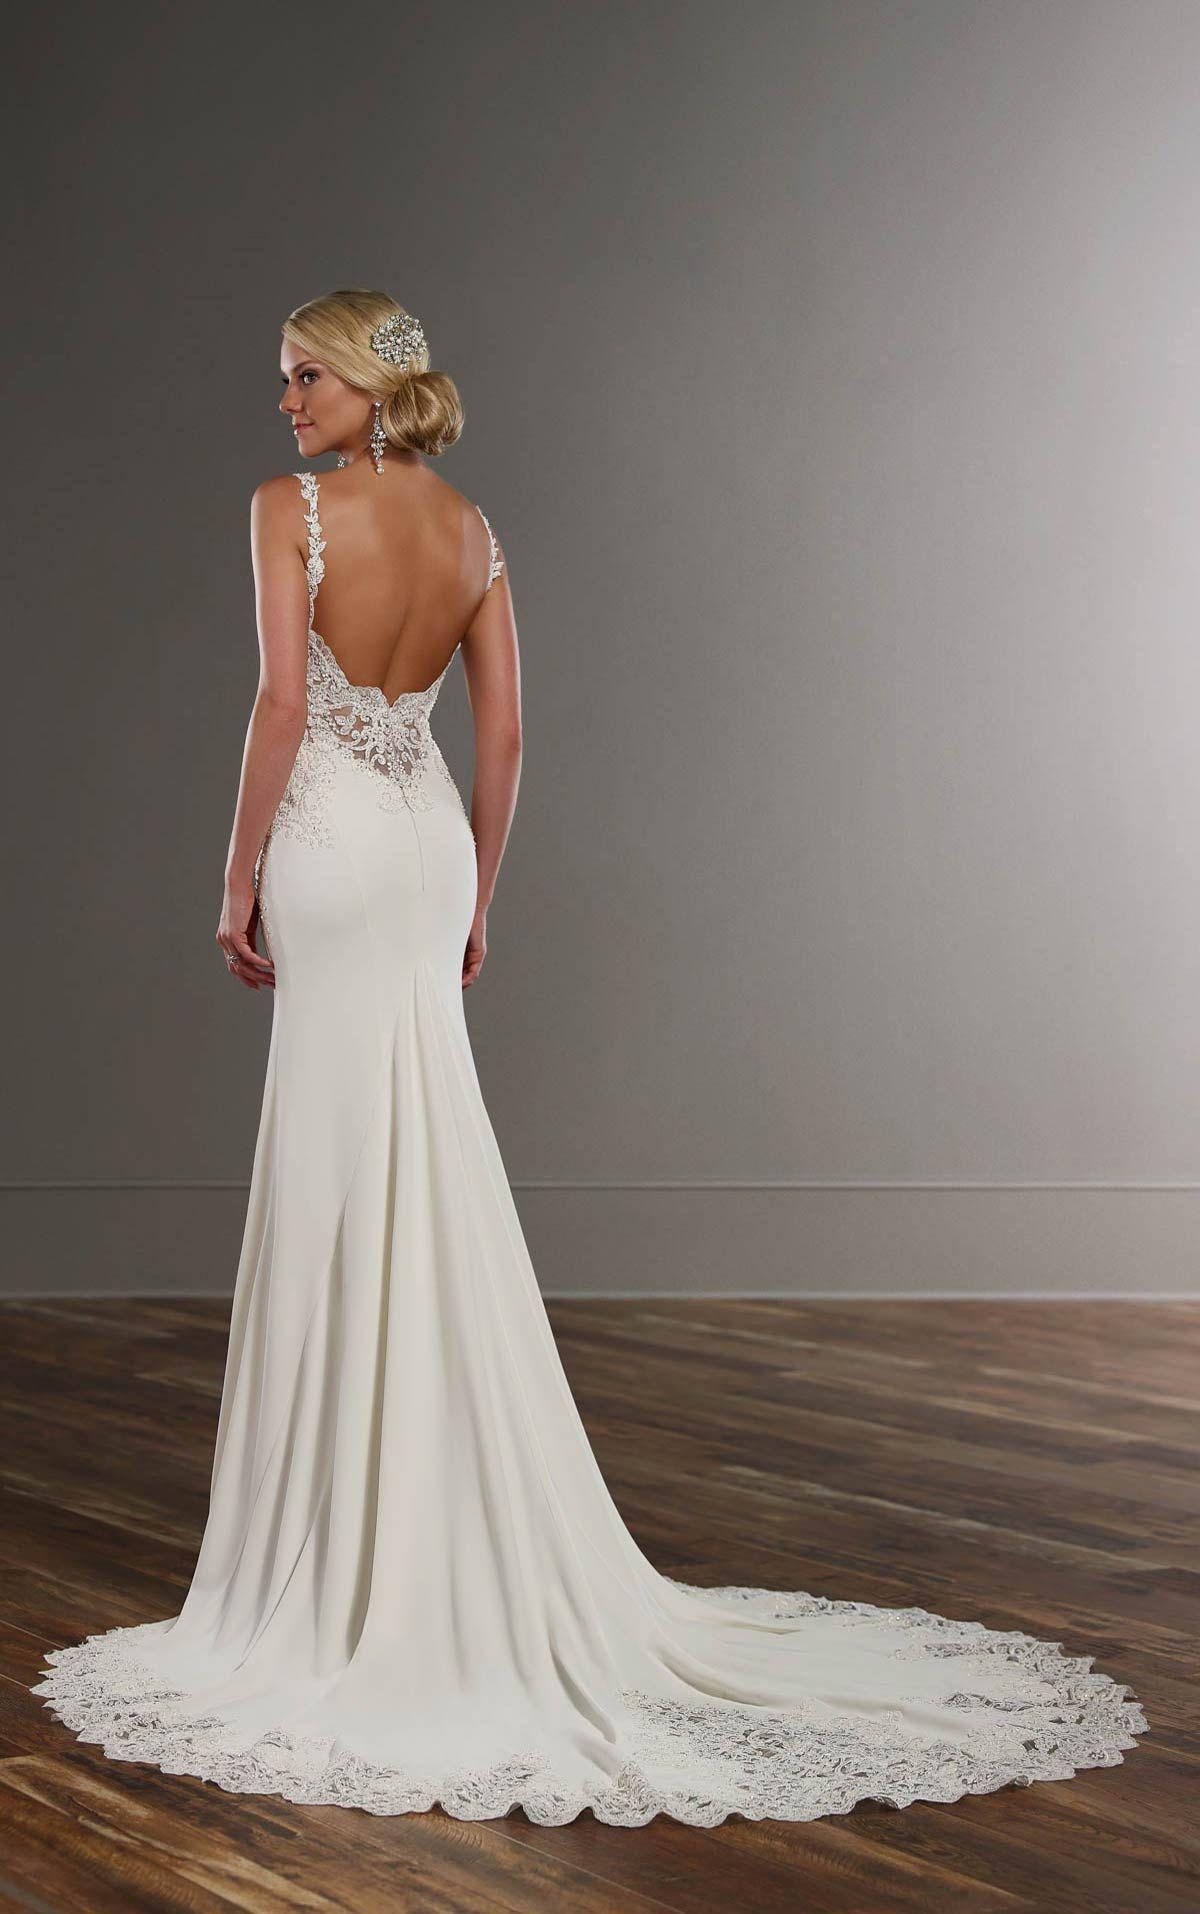 60 Perfect Low Back Wedding Dresses | Wedding dress, Backless ...